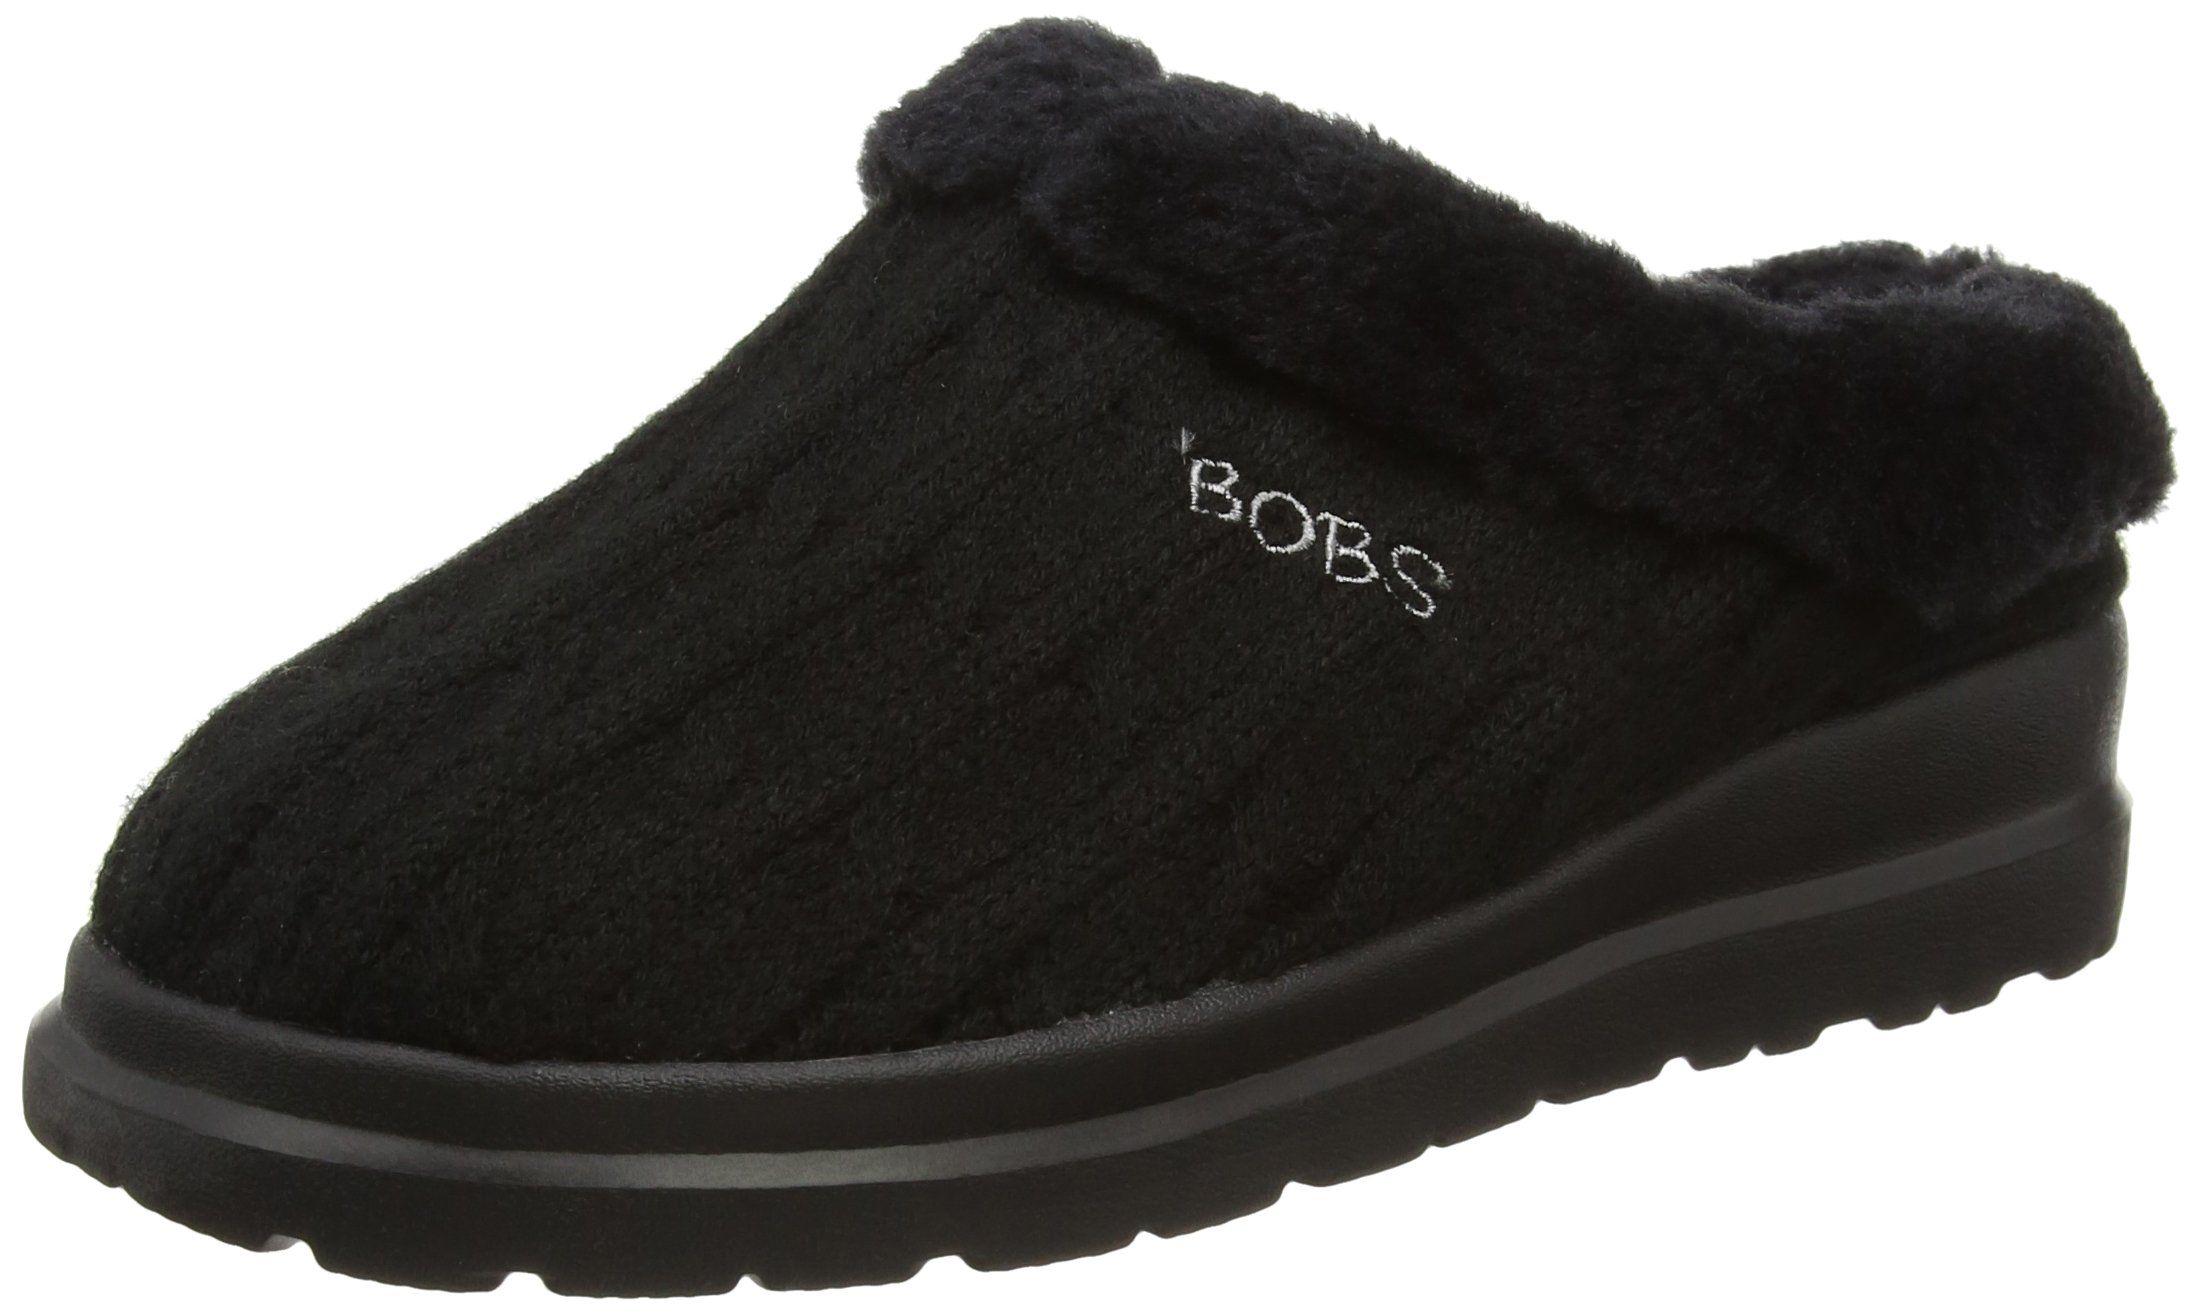 Skechers Bobs Cherish Wonder Fall Womens Slipper Clogs Black 9